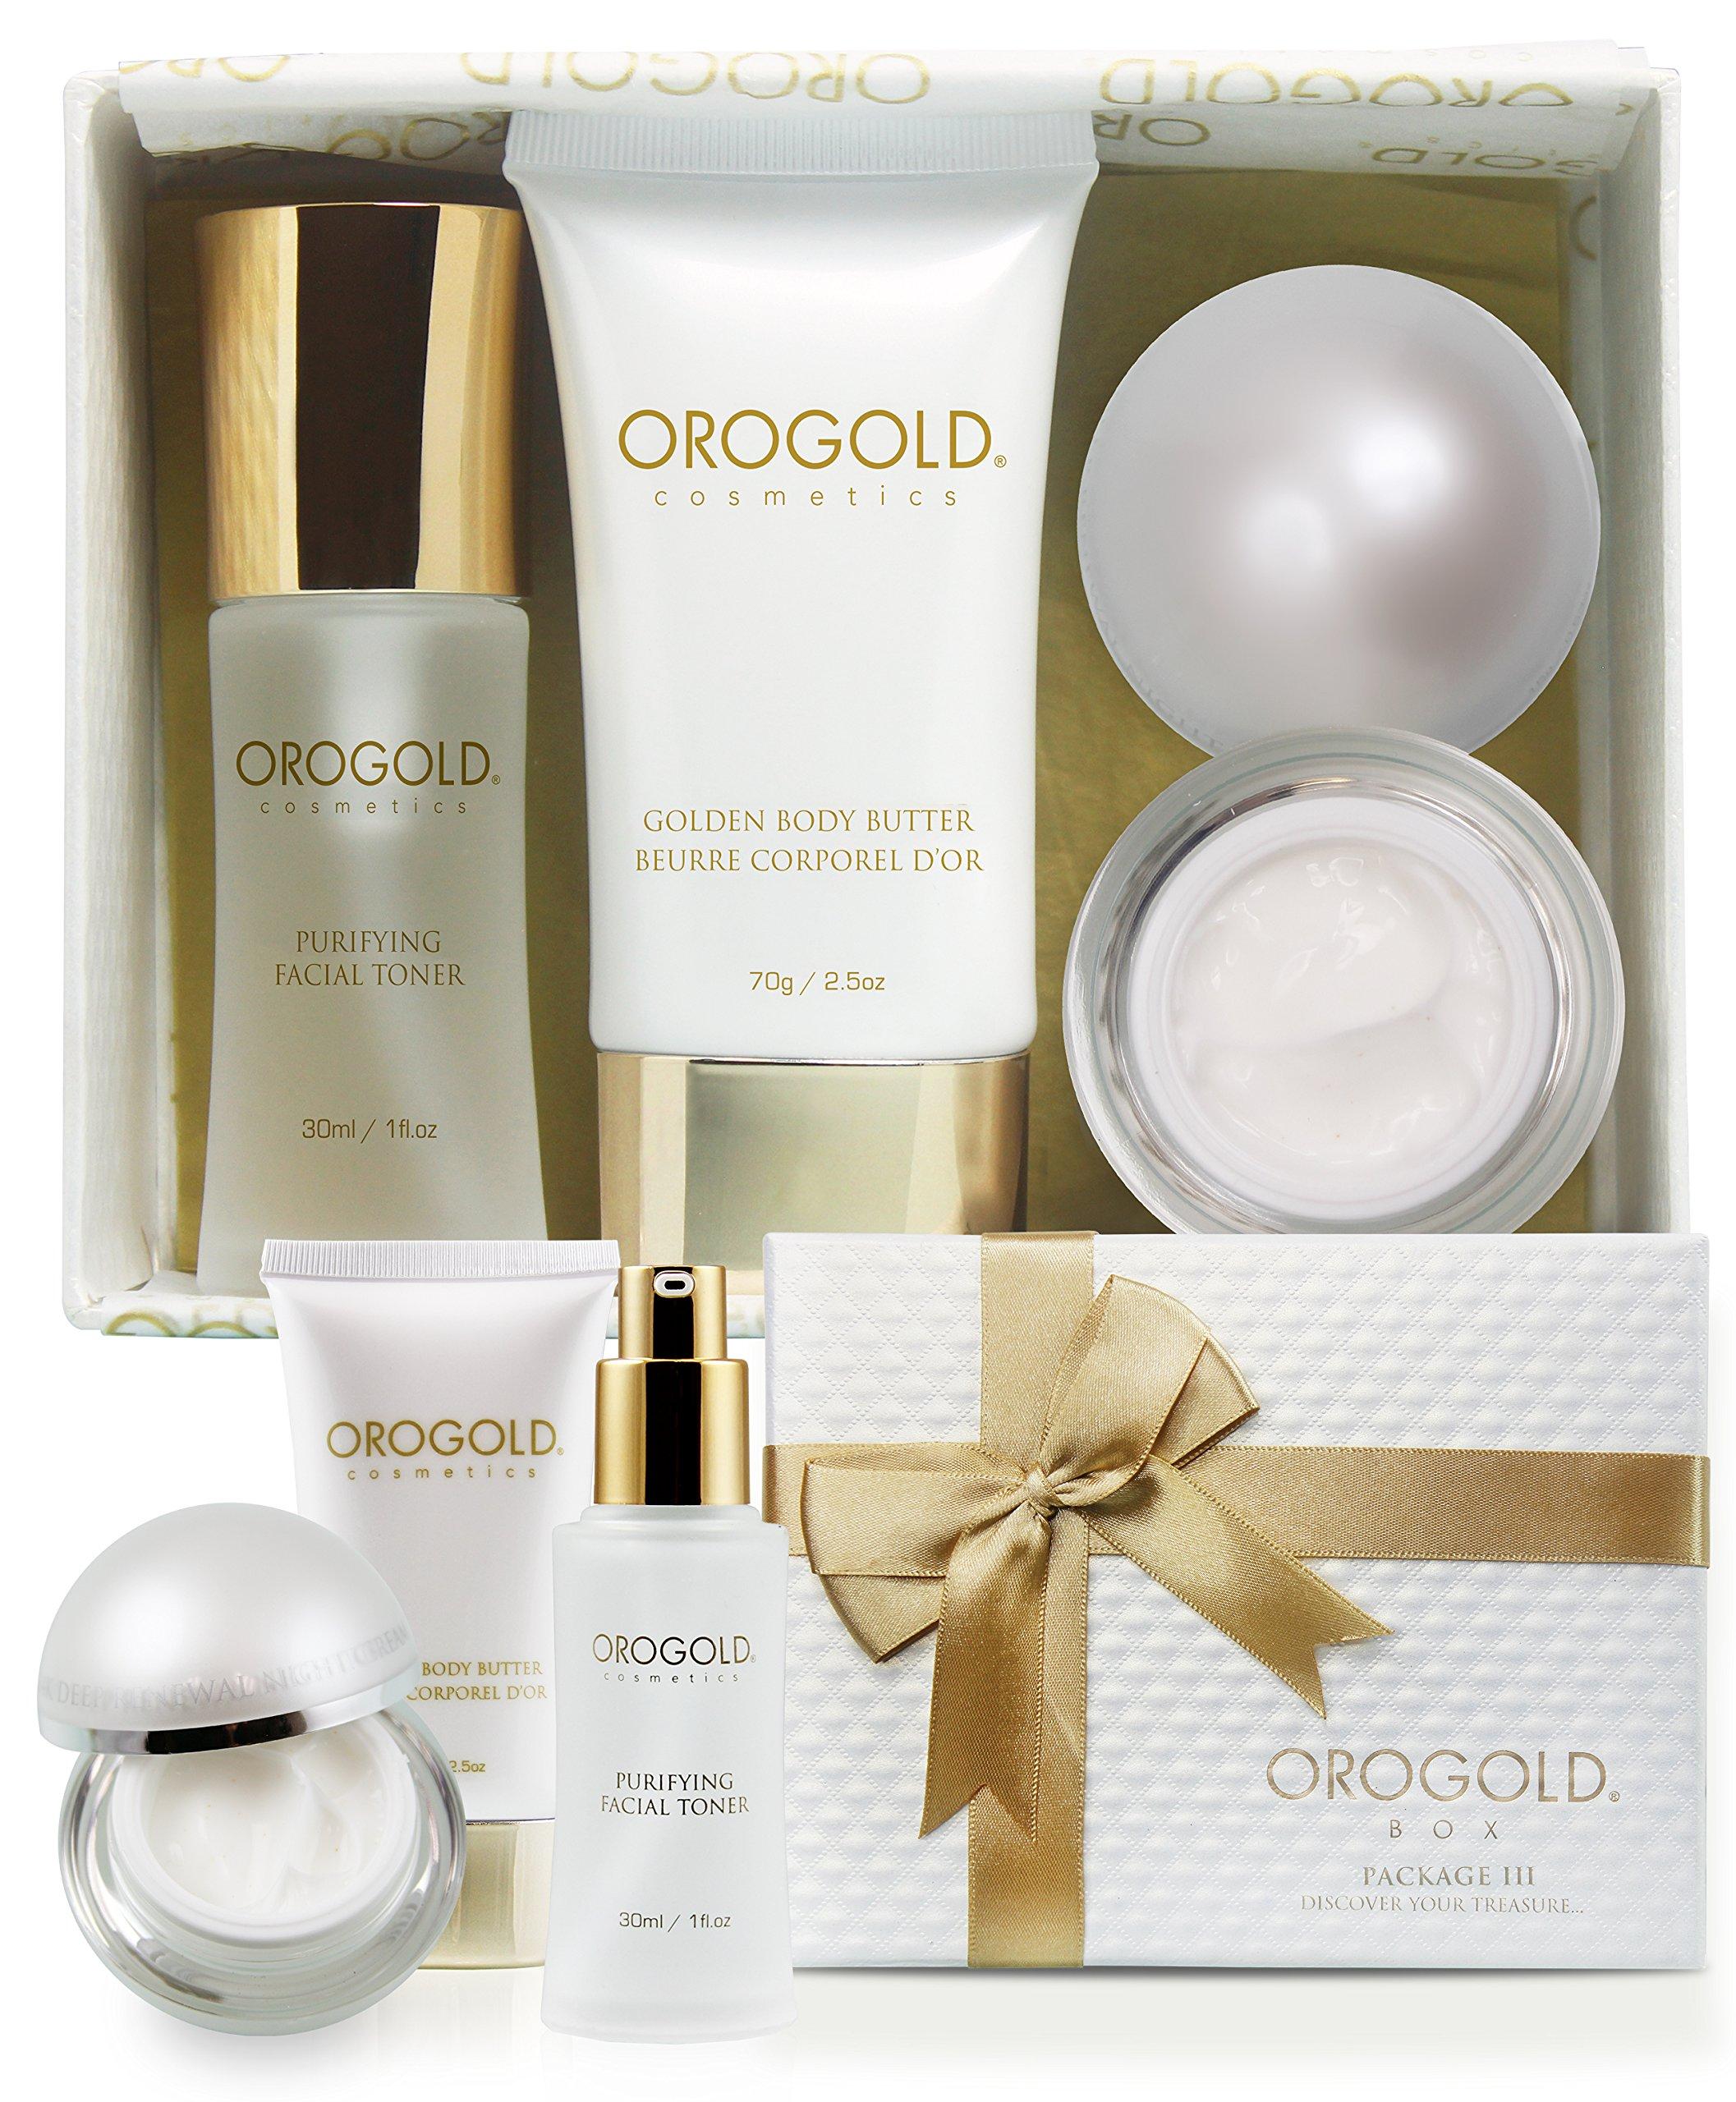 ویکالا · خرید  اصل اورجینال · خرید از آمازون · 24K Luxury Gift Set for Women | Authentic Gold Travel Skin Care Set From Orogold |24K Facial Toner | Gold Flecked Night Cream For Tired Skin | Gilded Body Butter For Smooth Skin| Bashful in Gold! wekala · ویکالا